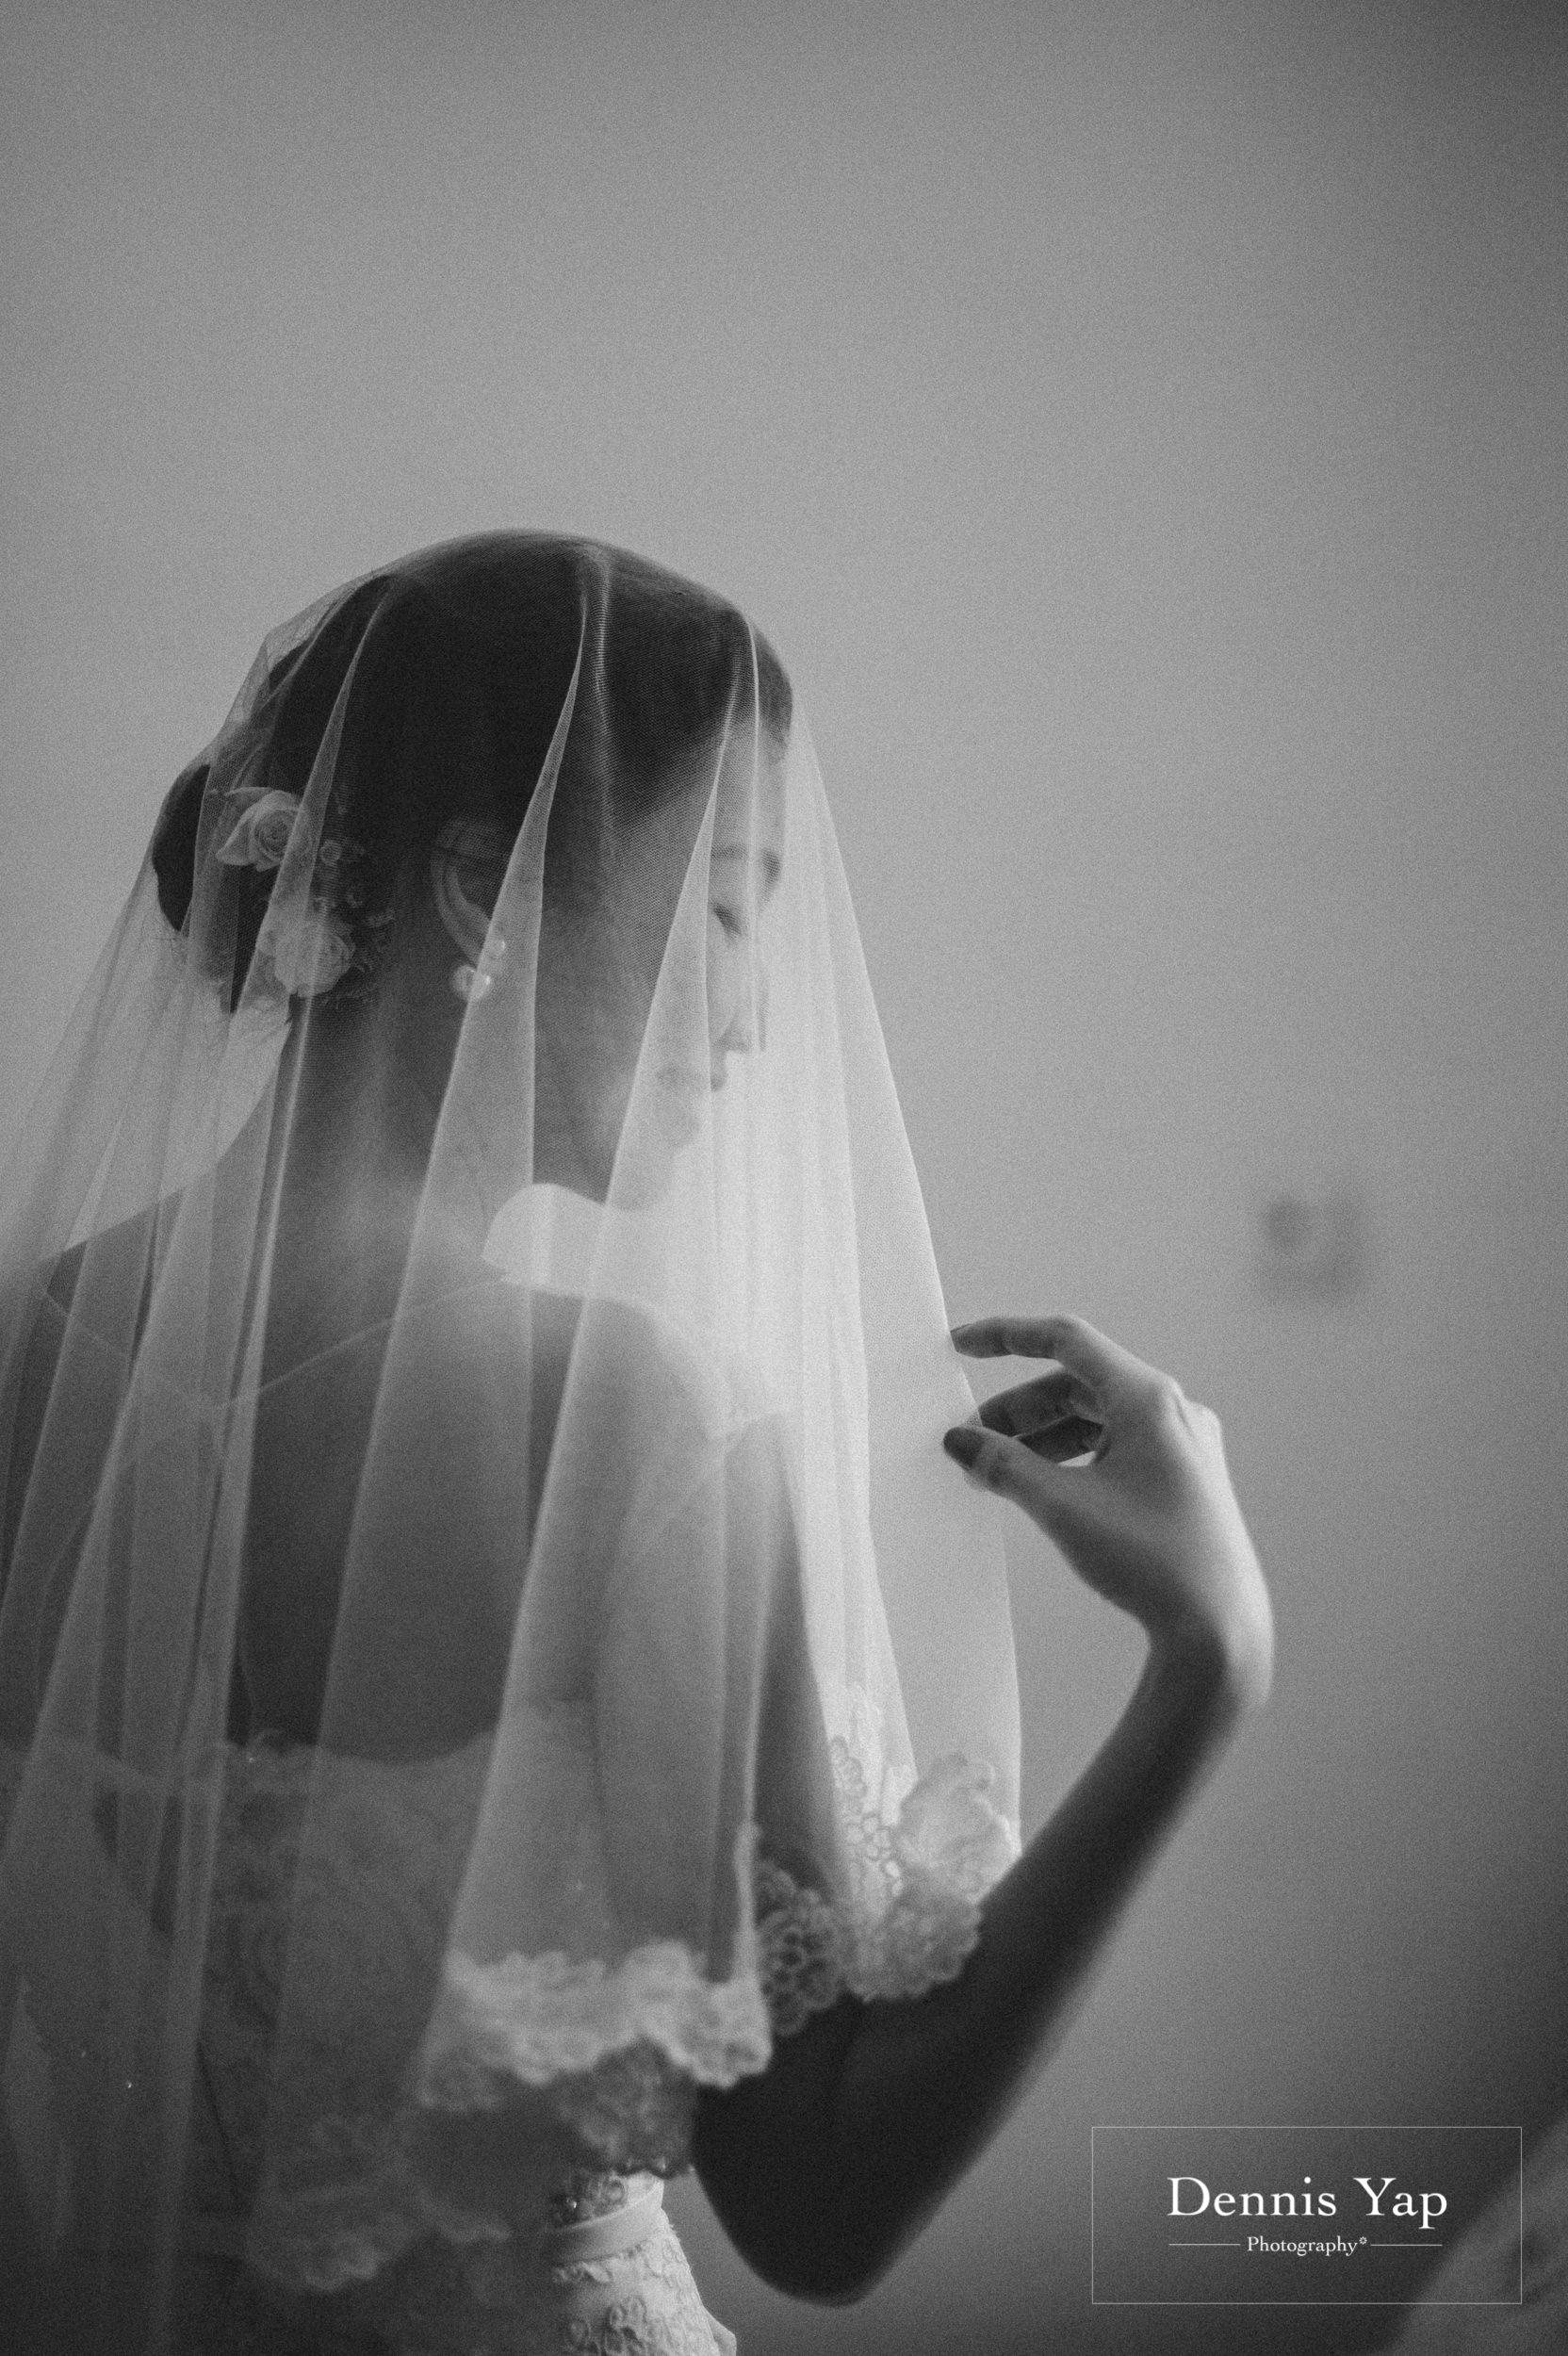 danny sherine wedding day group photo dennis yap photography usj heights malaysia top wedding photographer-7.jpg